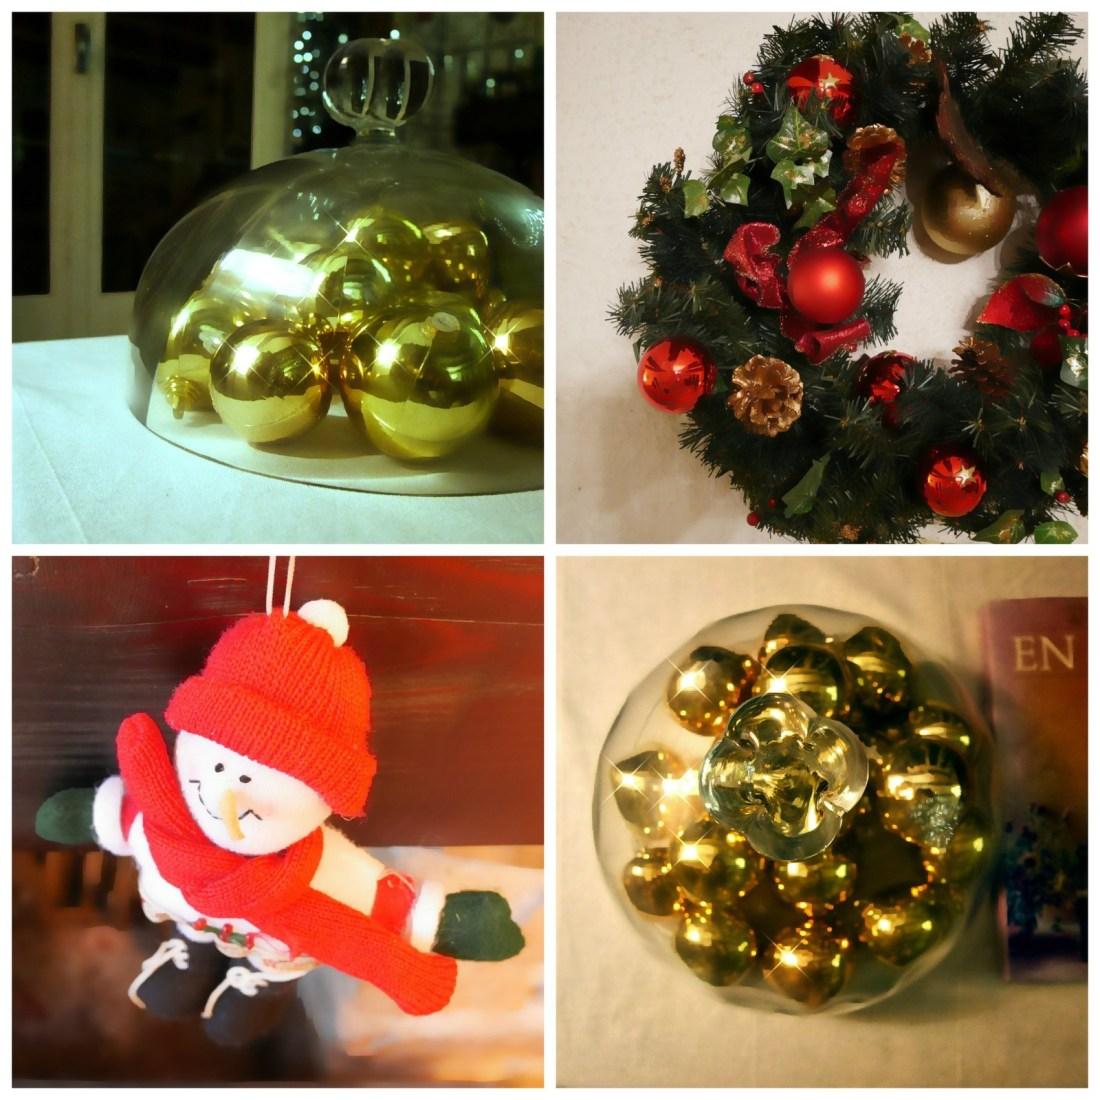 Noël, le sapin et moi...